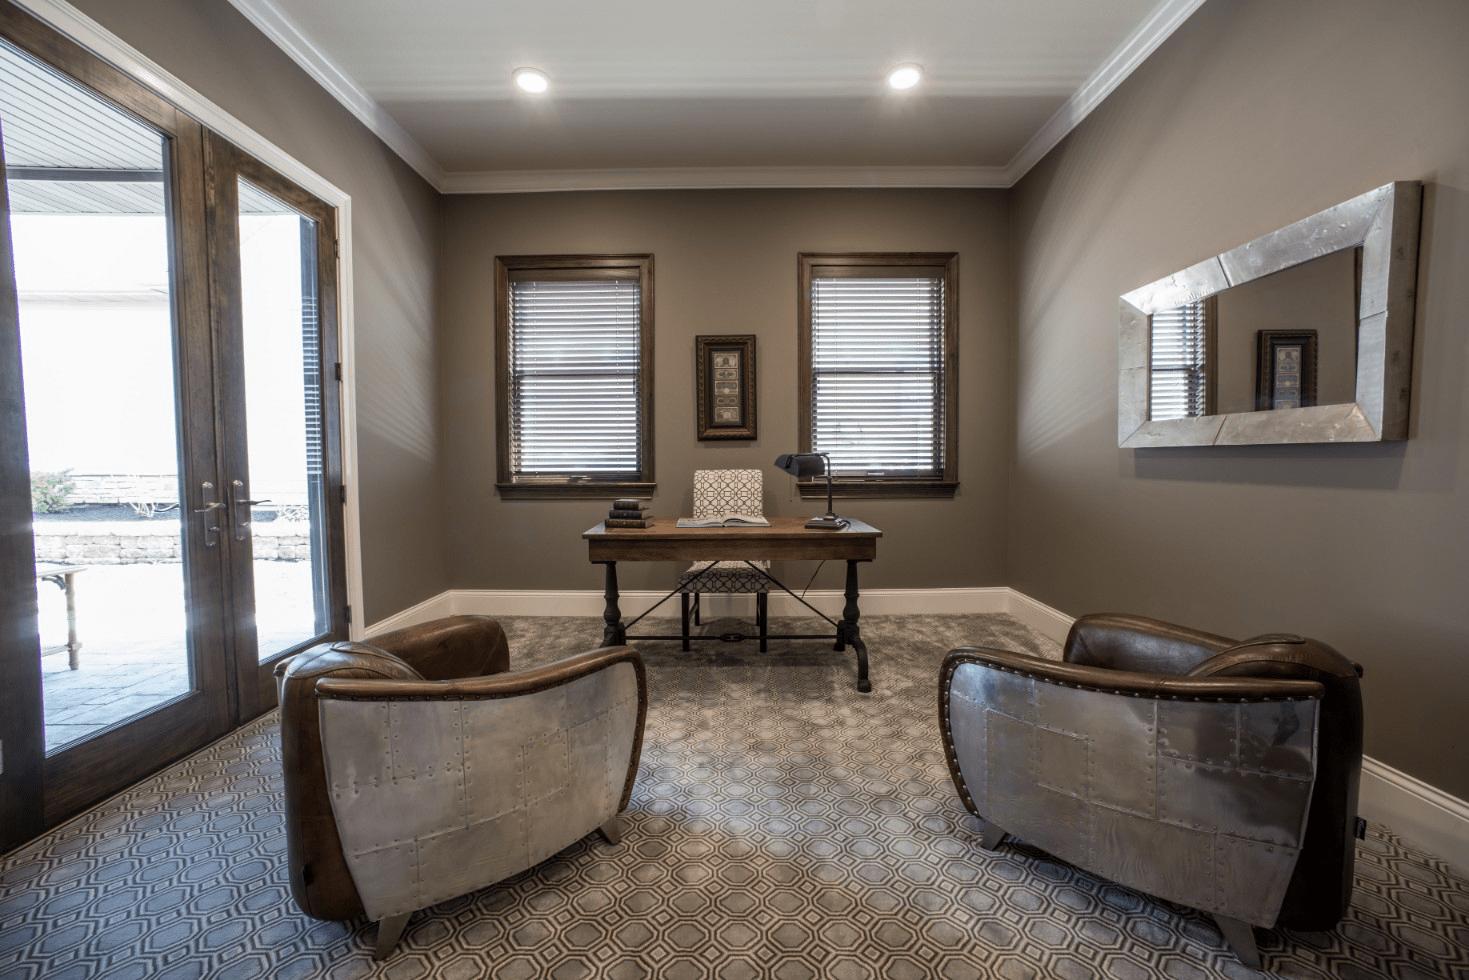 Window treatment | Johnston Paint & Decorating